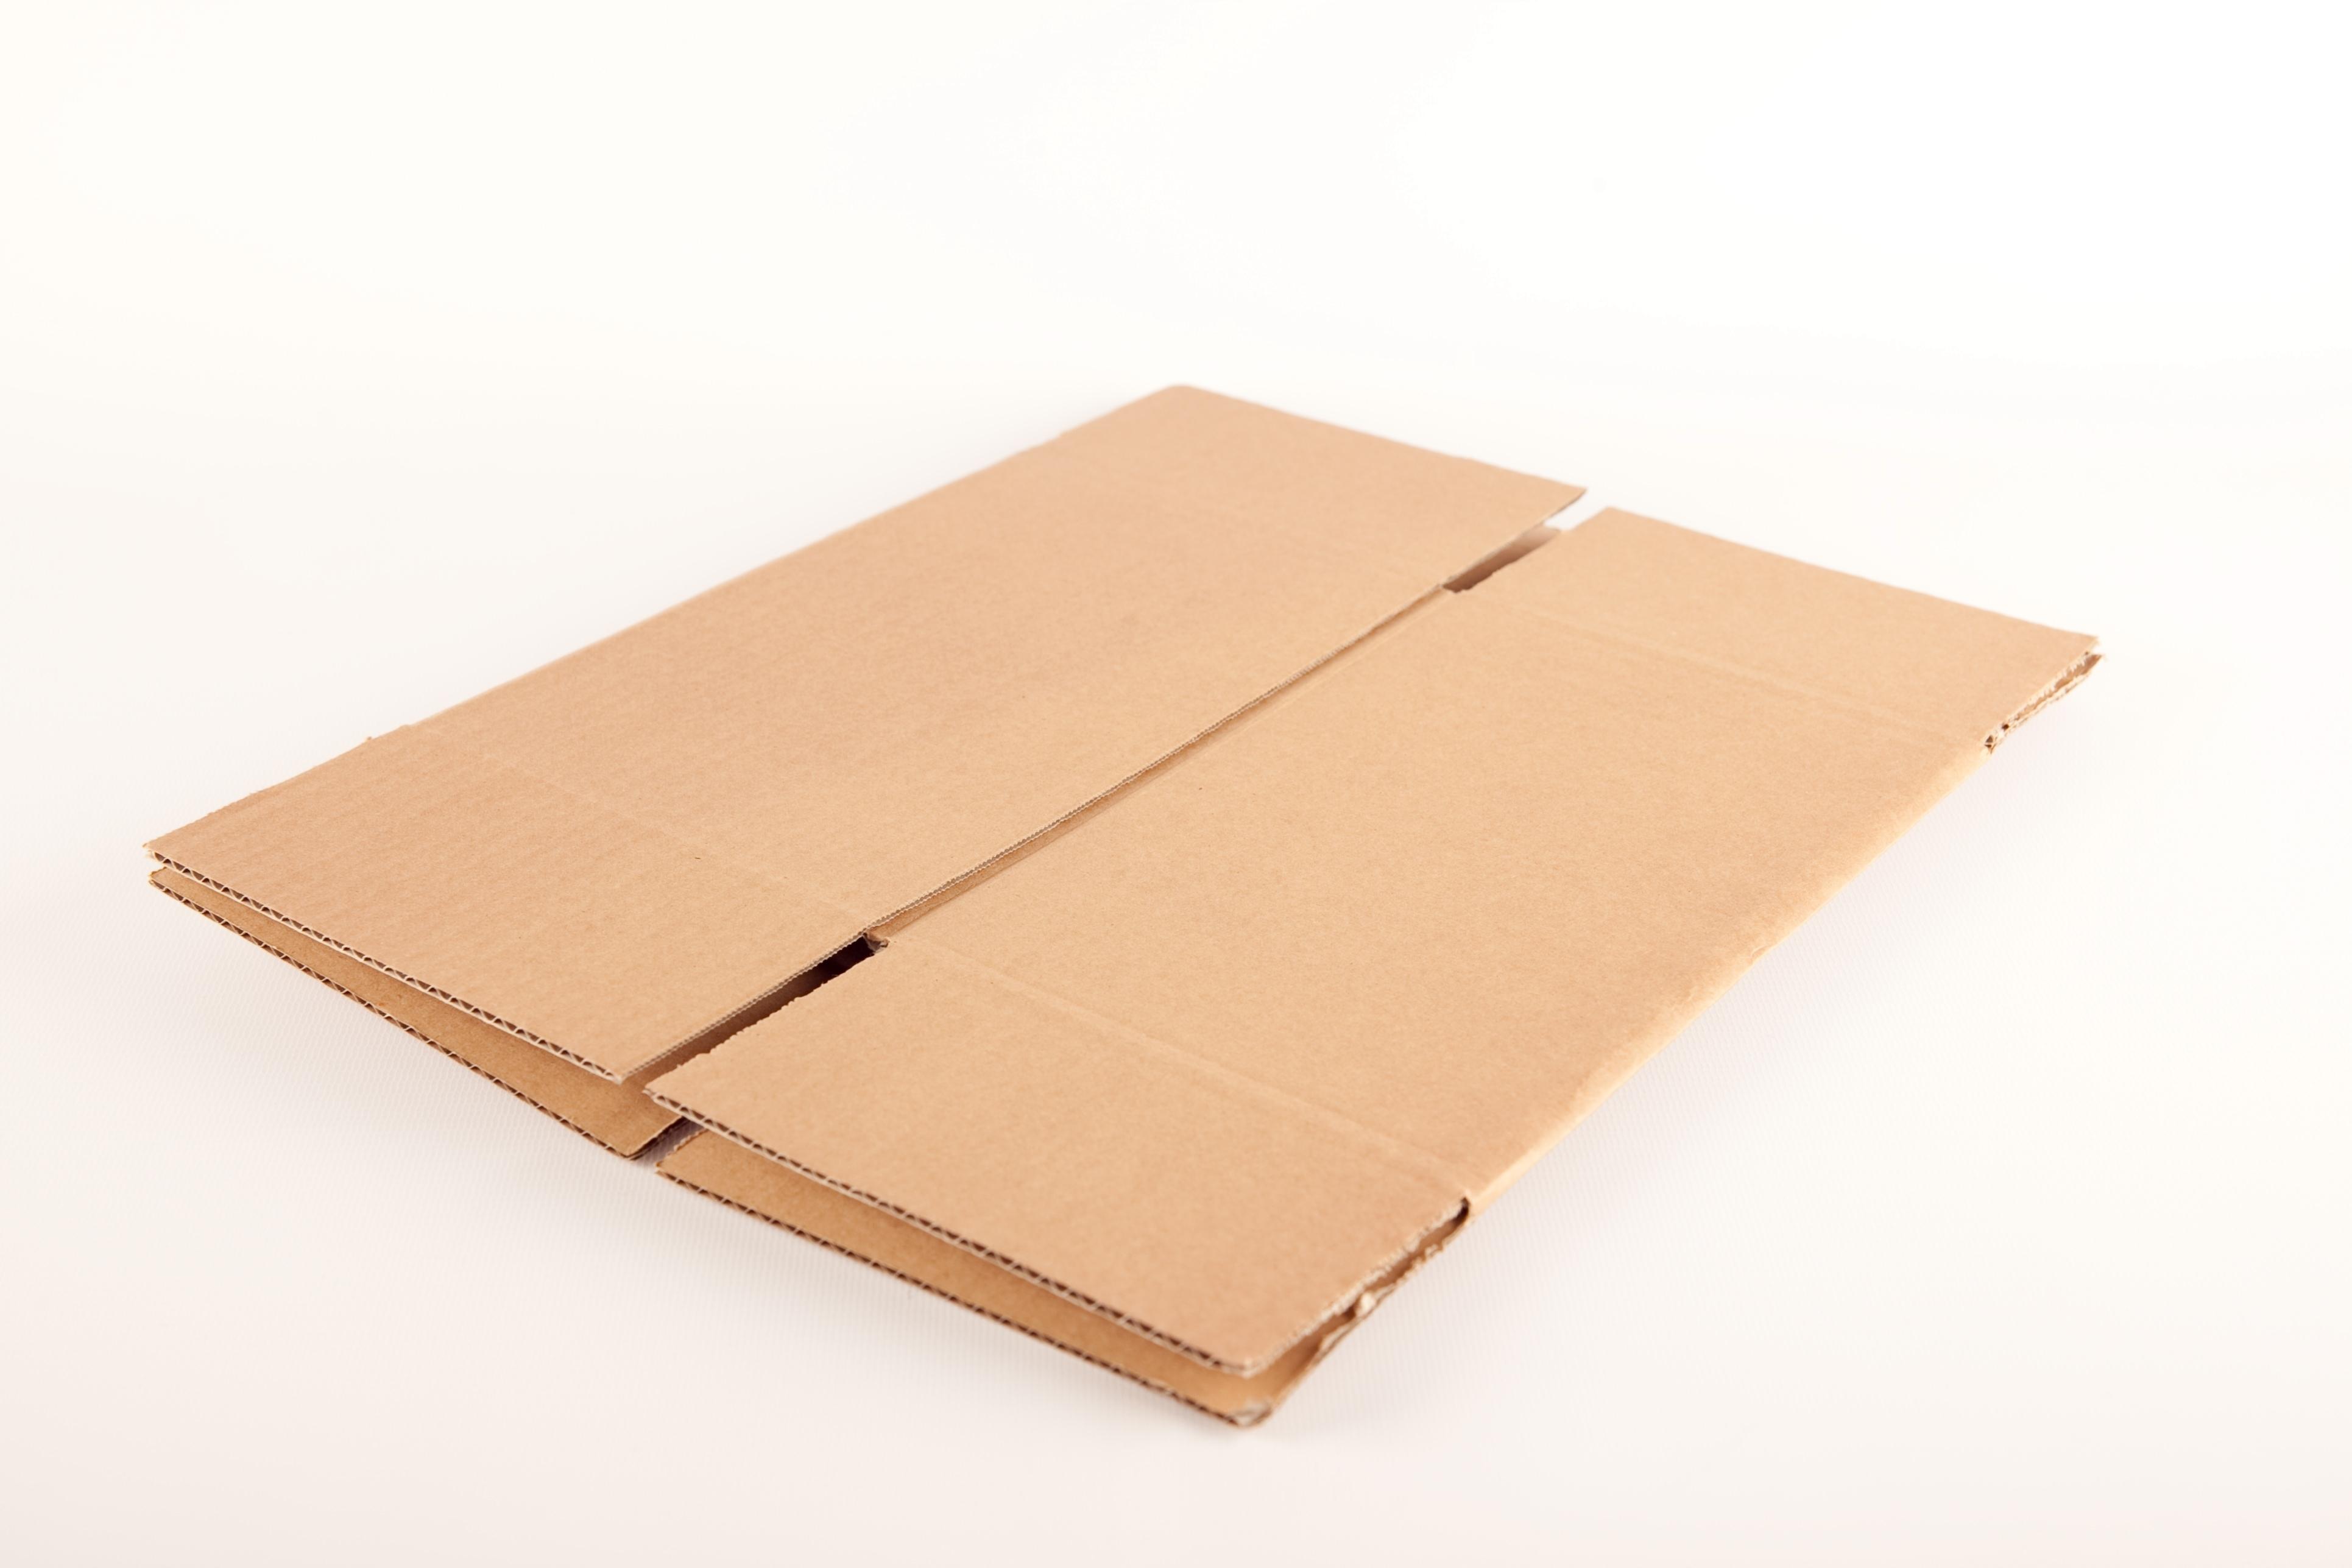 254 x 203 x 152mm Single Wall Boxes - 2